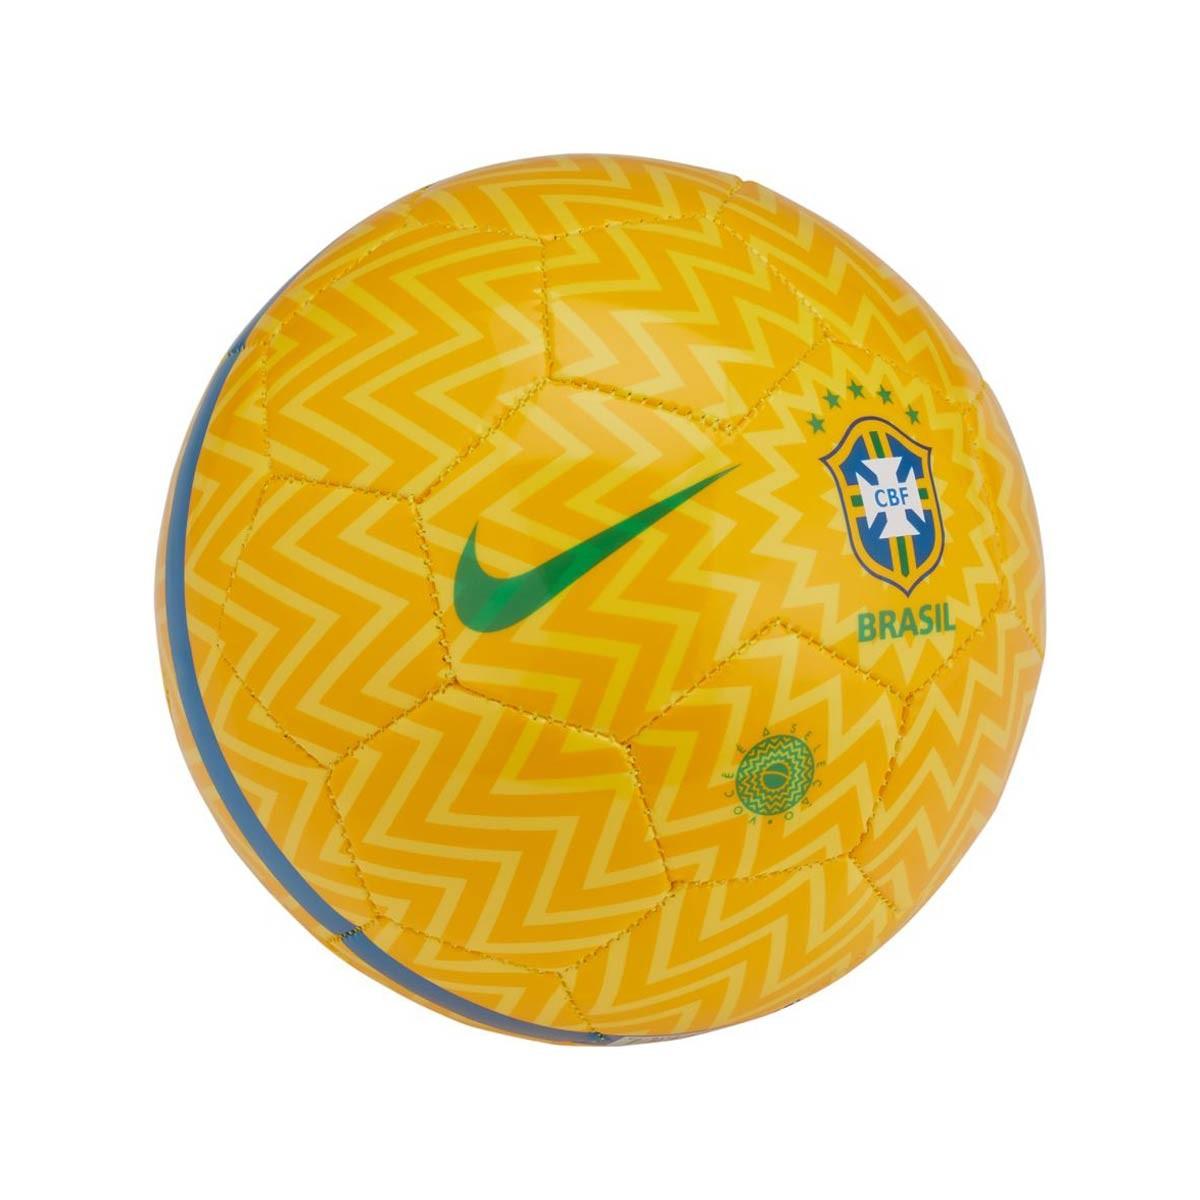 c8399abb97e47 Bola de Futebol Nike Mini Brasil Skills 2018-2019 Samba gold-Lucky green  soar - Loja de futebol Fútbol Emotion